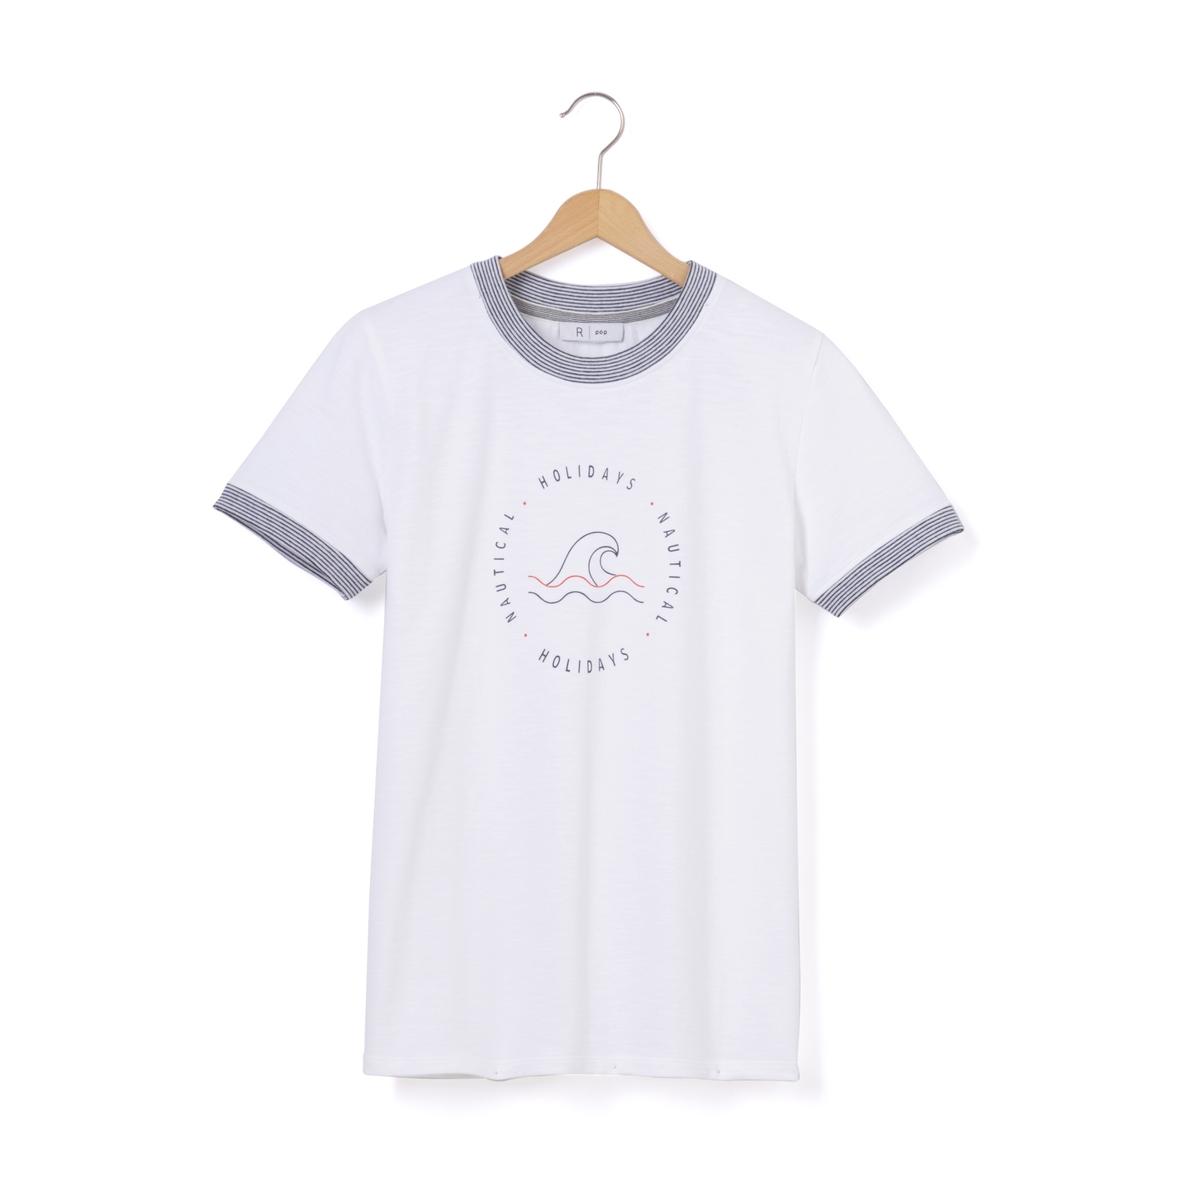 Футболка с круглым вырезом, рисунком и короткими рукавами футболка с круглым вырезом рисунком и короткими рукавами